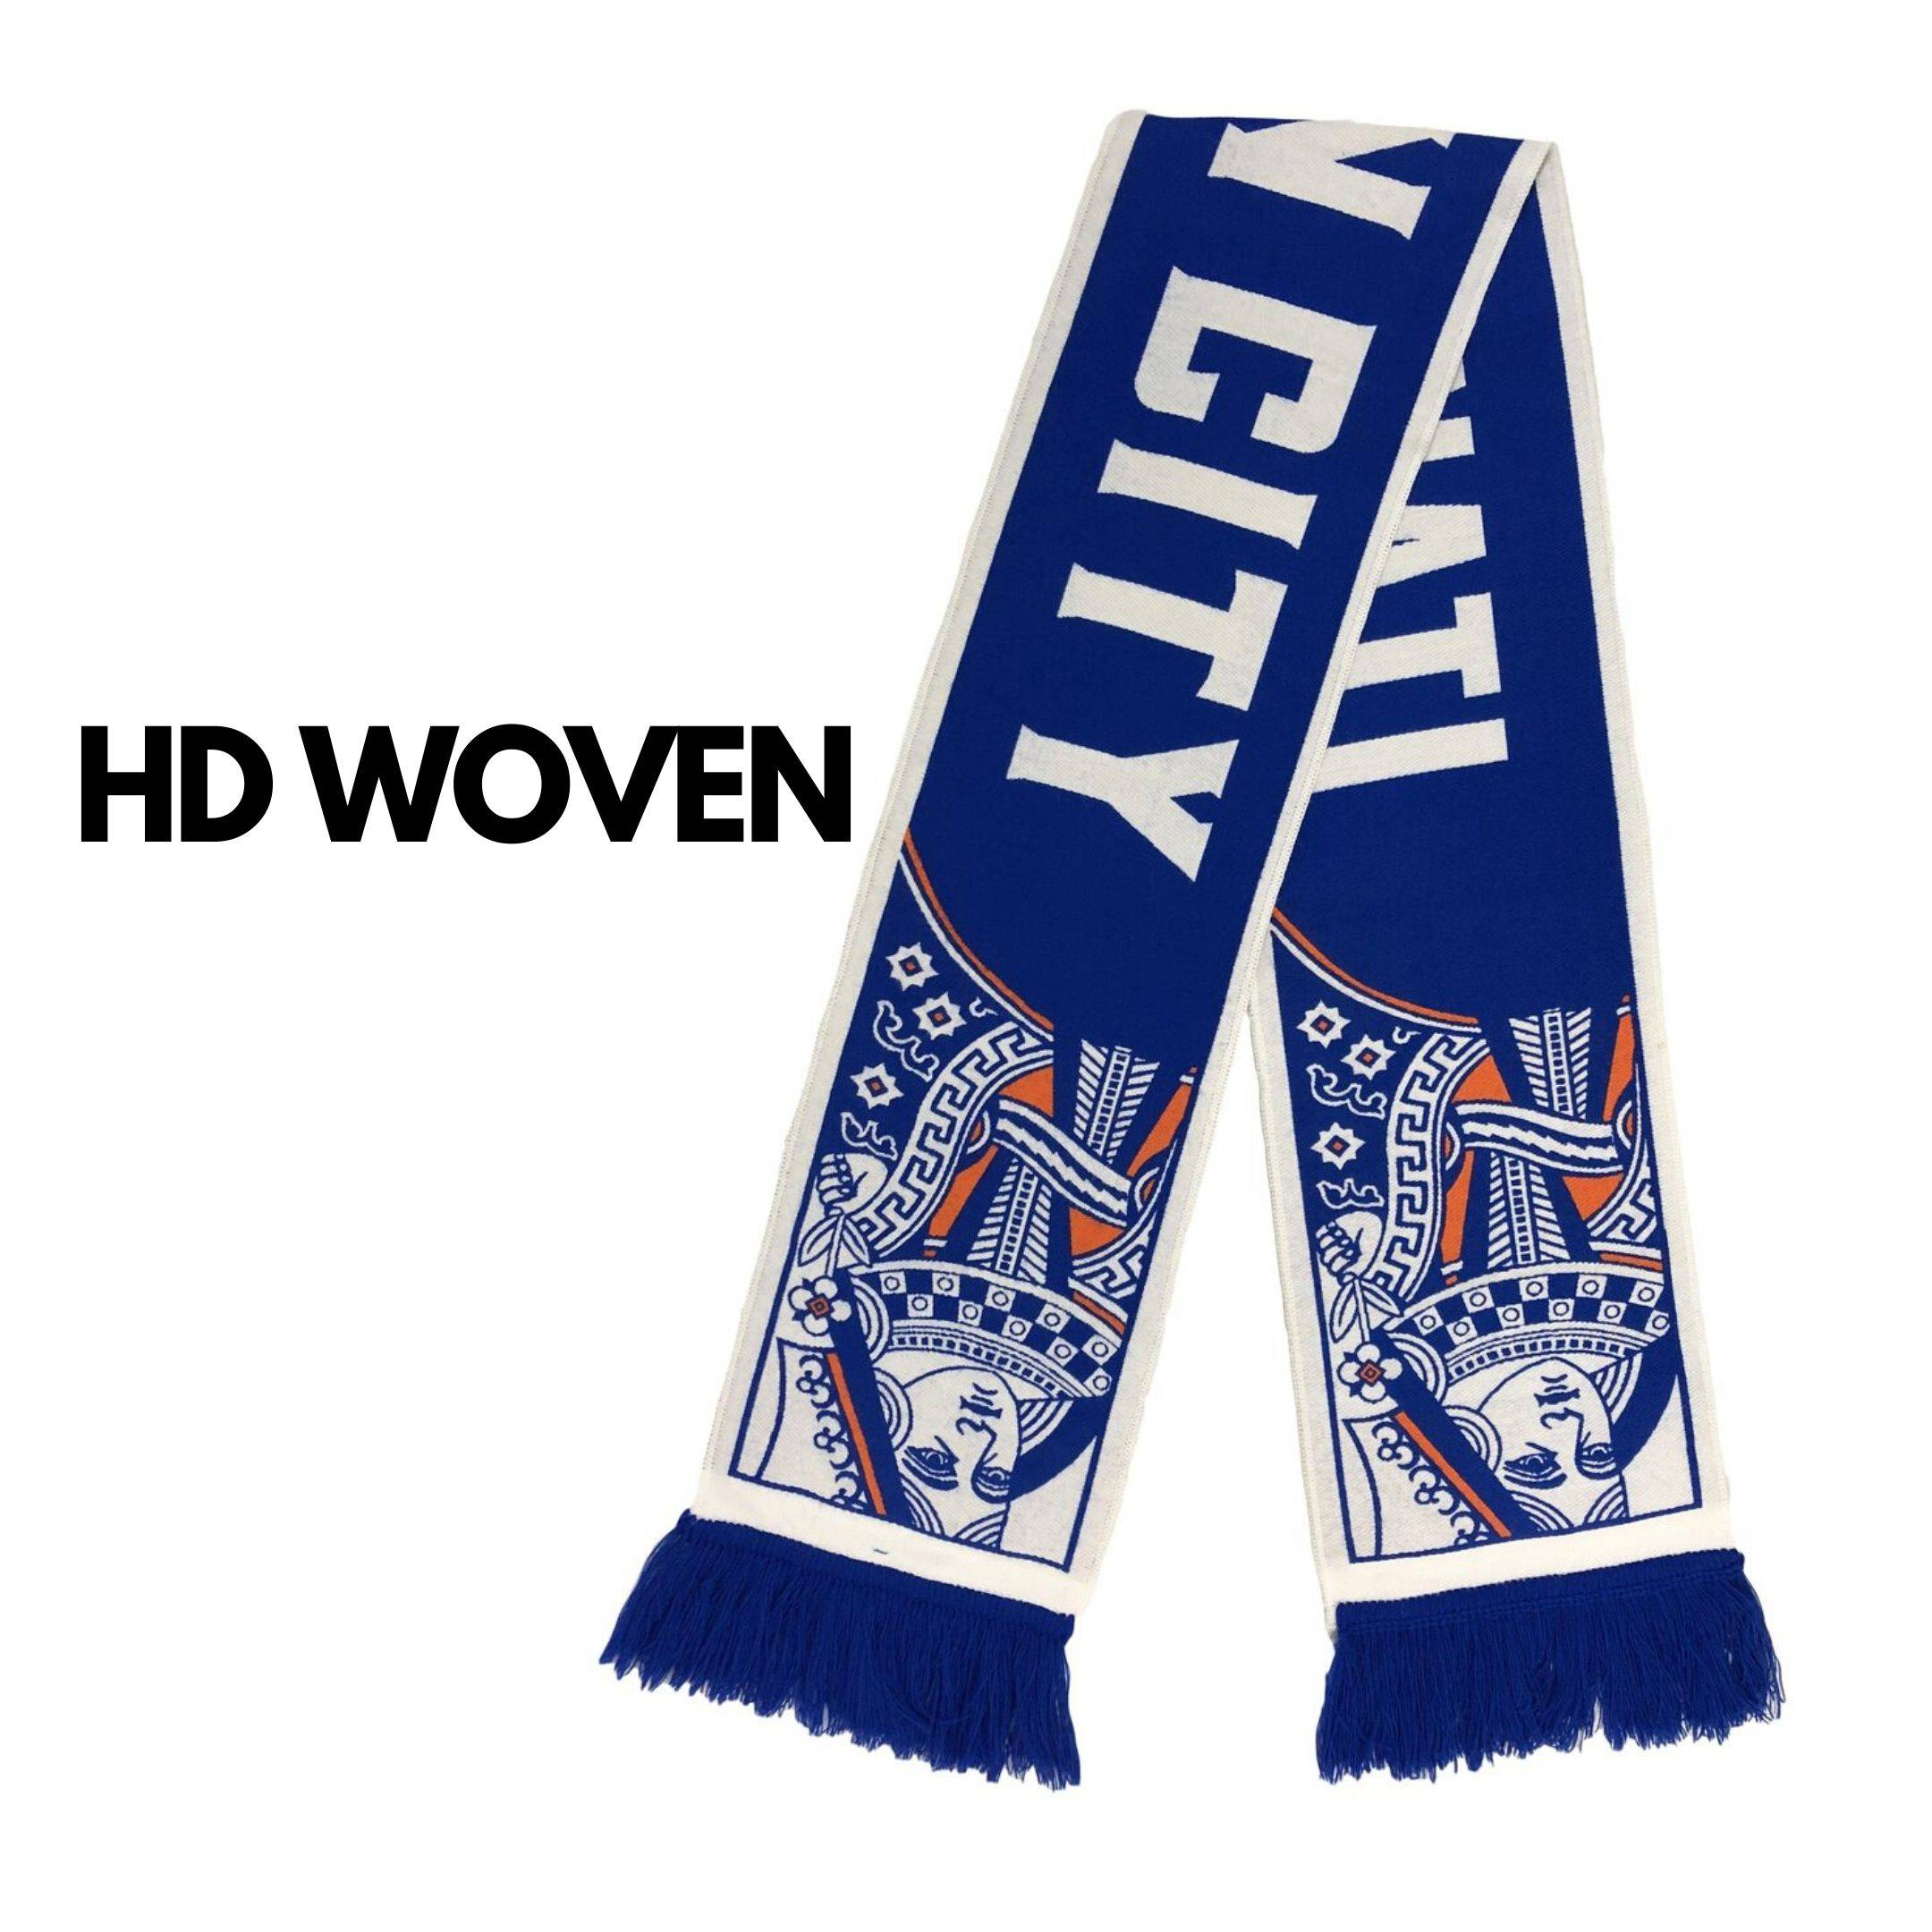 HD Woven scarf